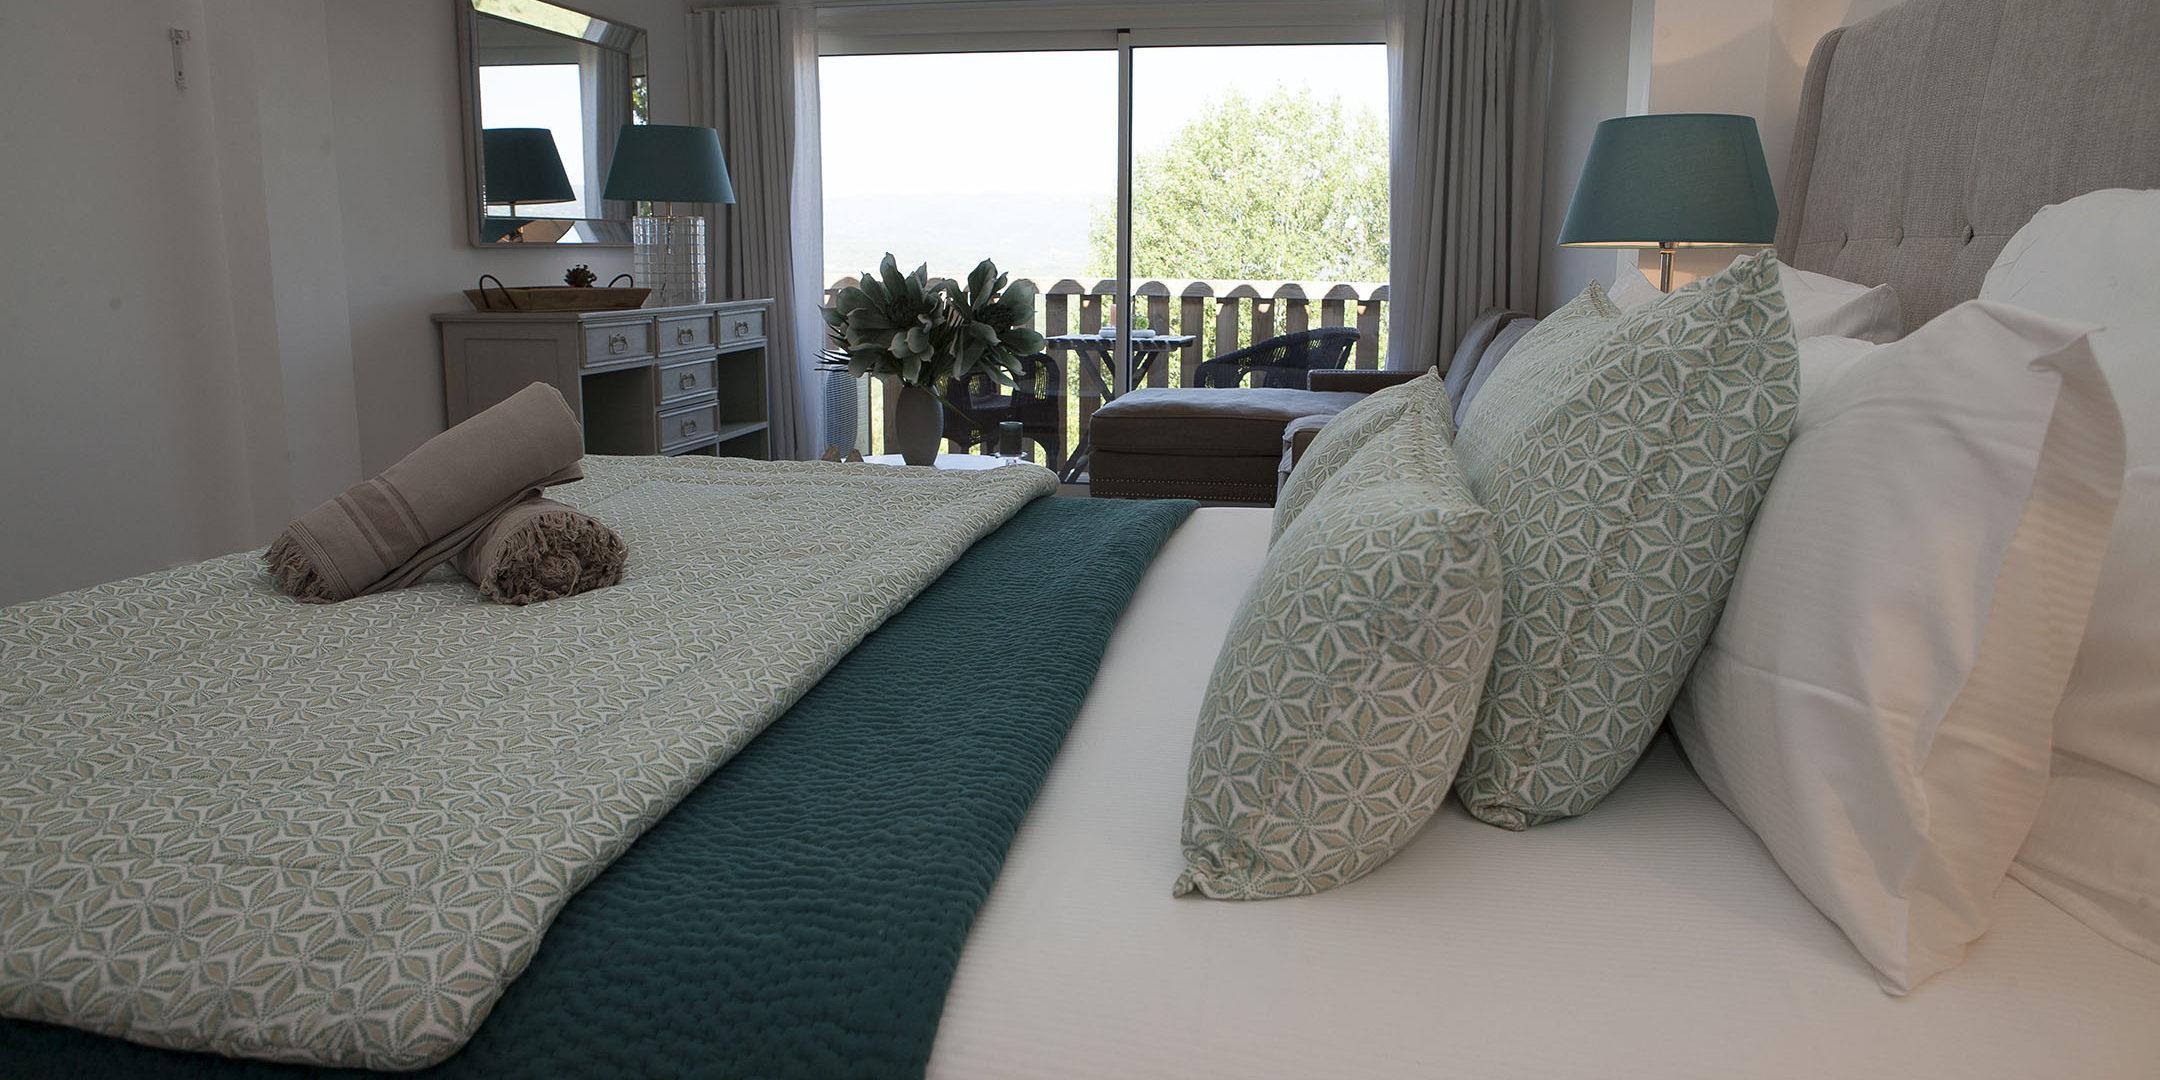 chambres de luxe h tel font mourier. Black Bedroom Furniture Sets. Home Design Ideas